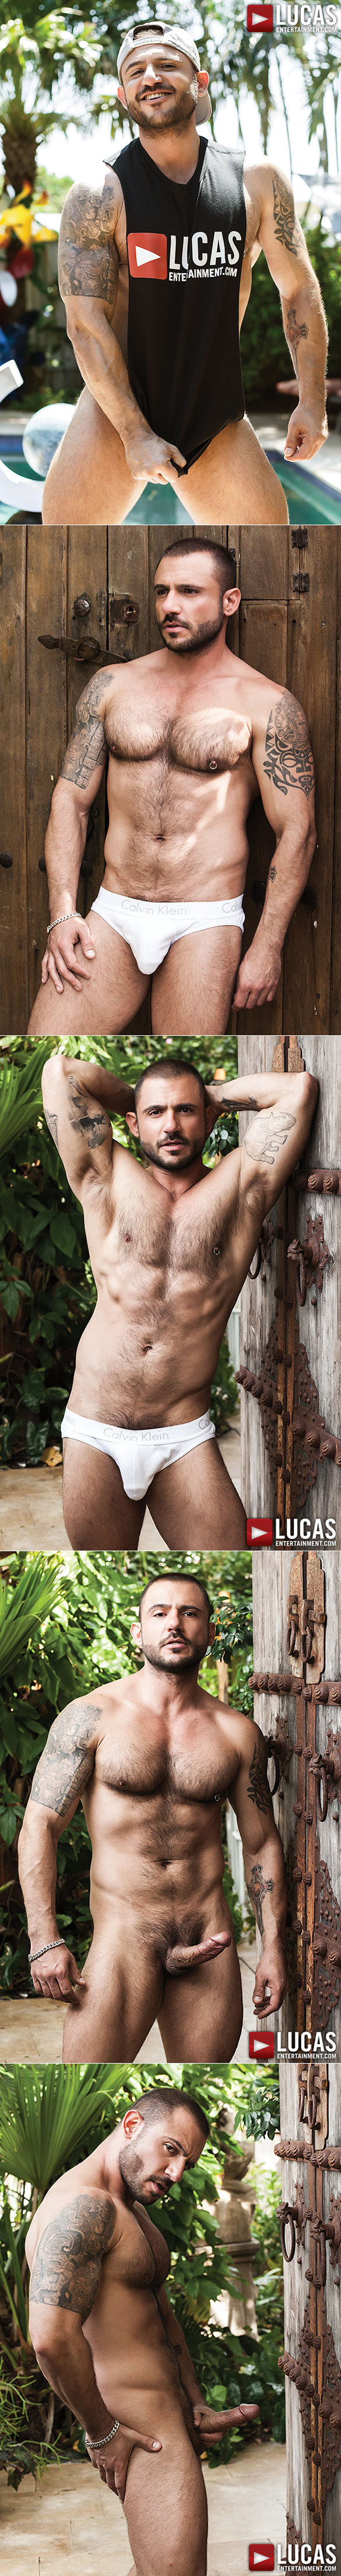 Lucas Entertainment: Sean Duran's bareback sex premiere with Pedro Andreas